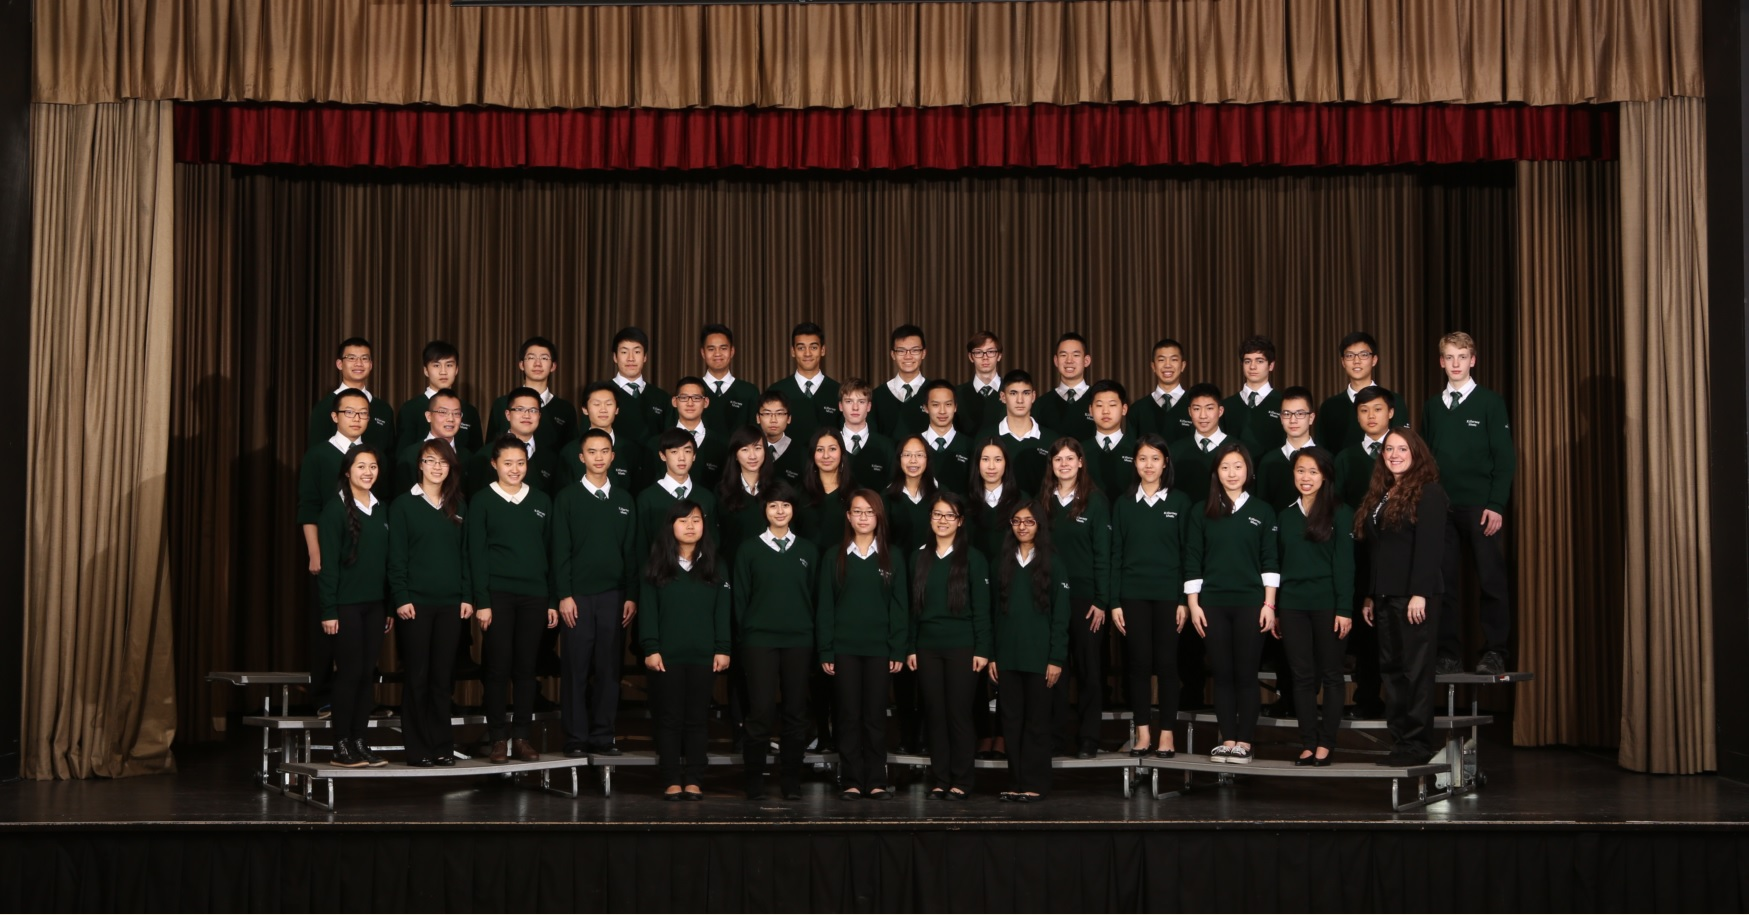 Killarney Concert Band